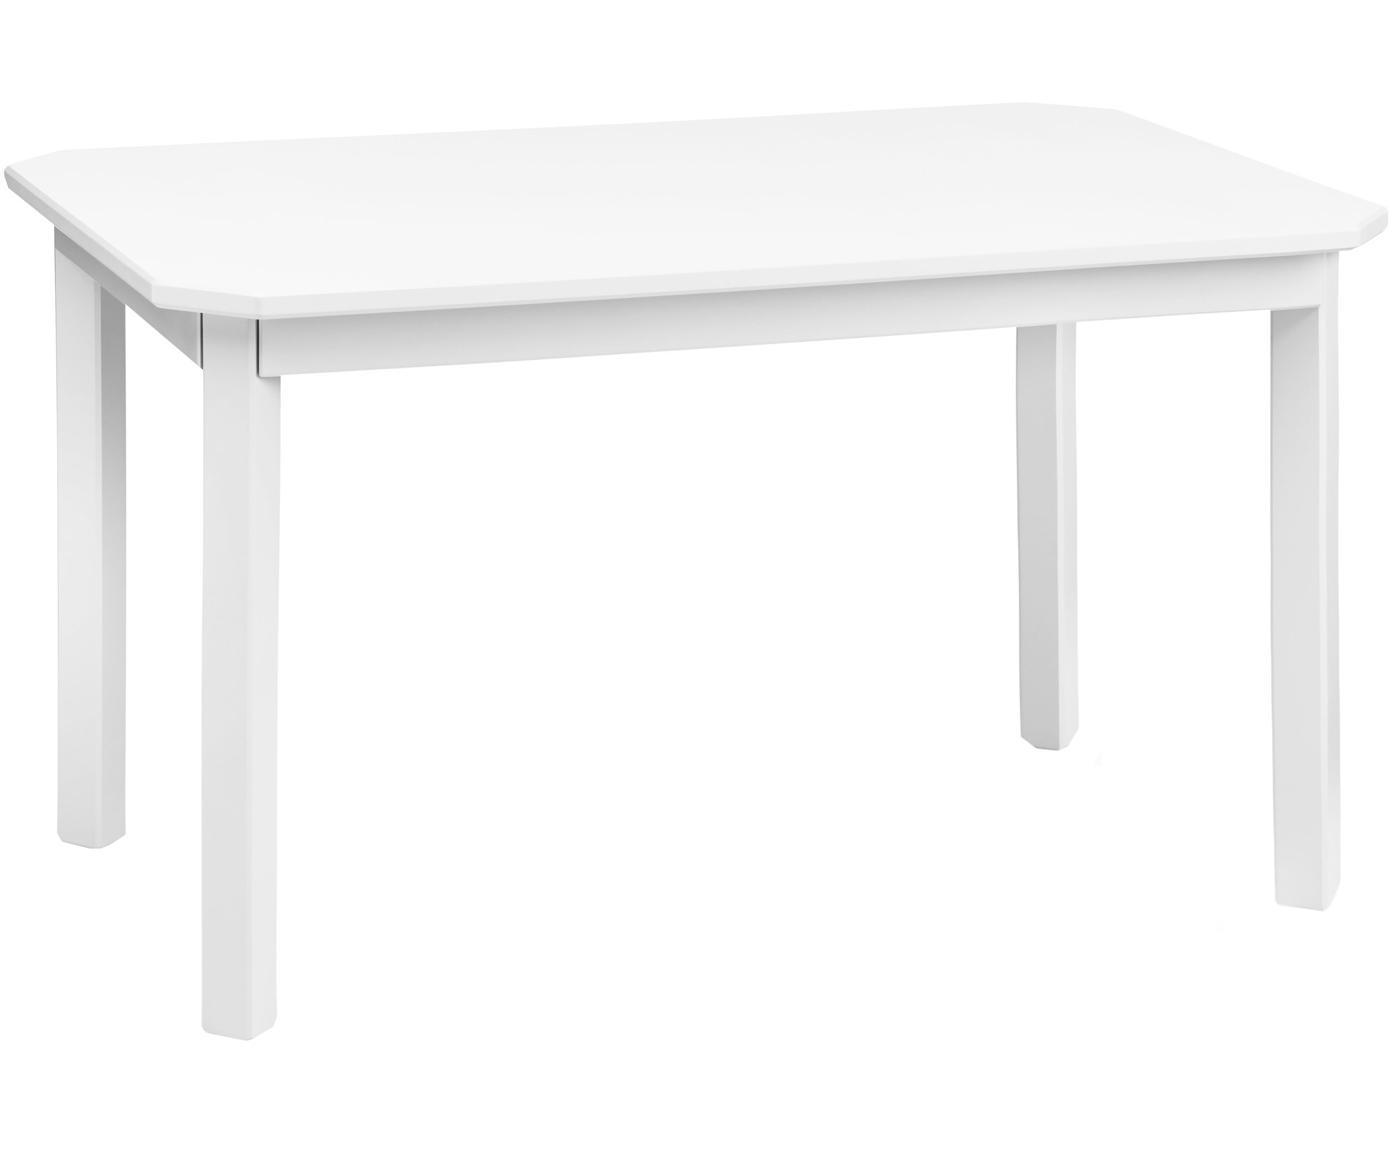 Mesa infantil Harlequin, Madera de abedul, tablero de fibras de densidad media (MDF), pintado, Blanco, An 79 x Al 47 cm